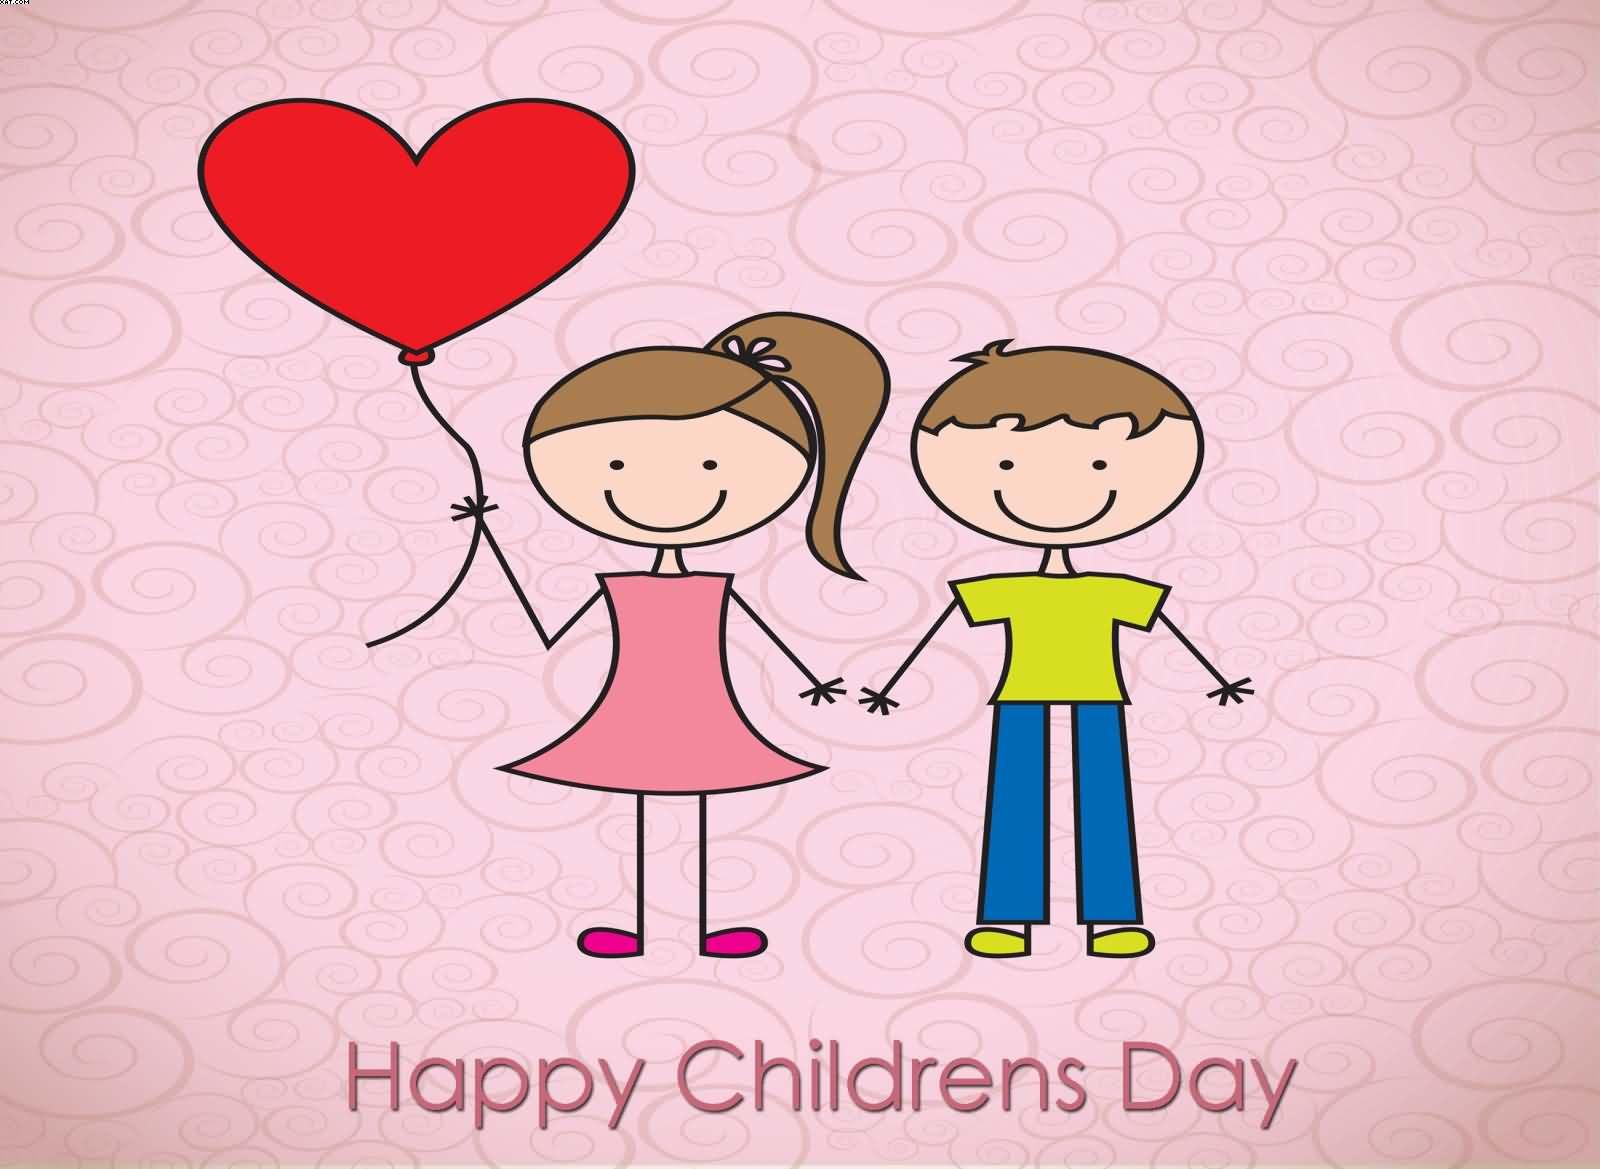 Anime Cartoon Happy Children's Day wallpaper